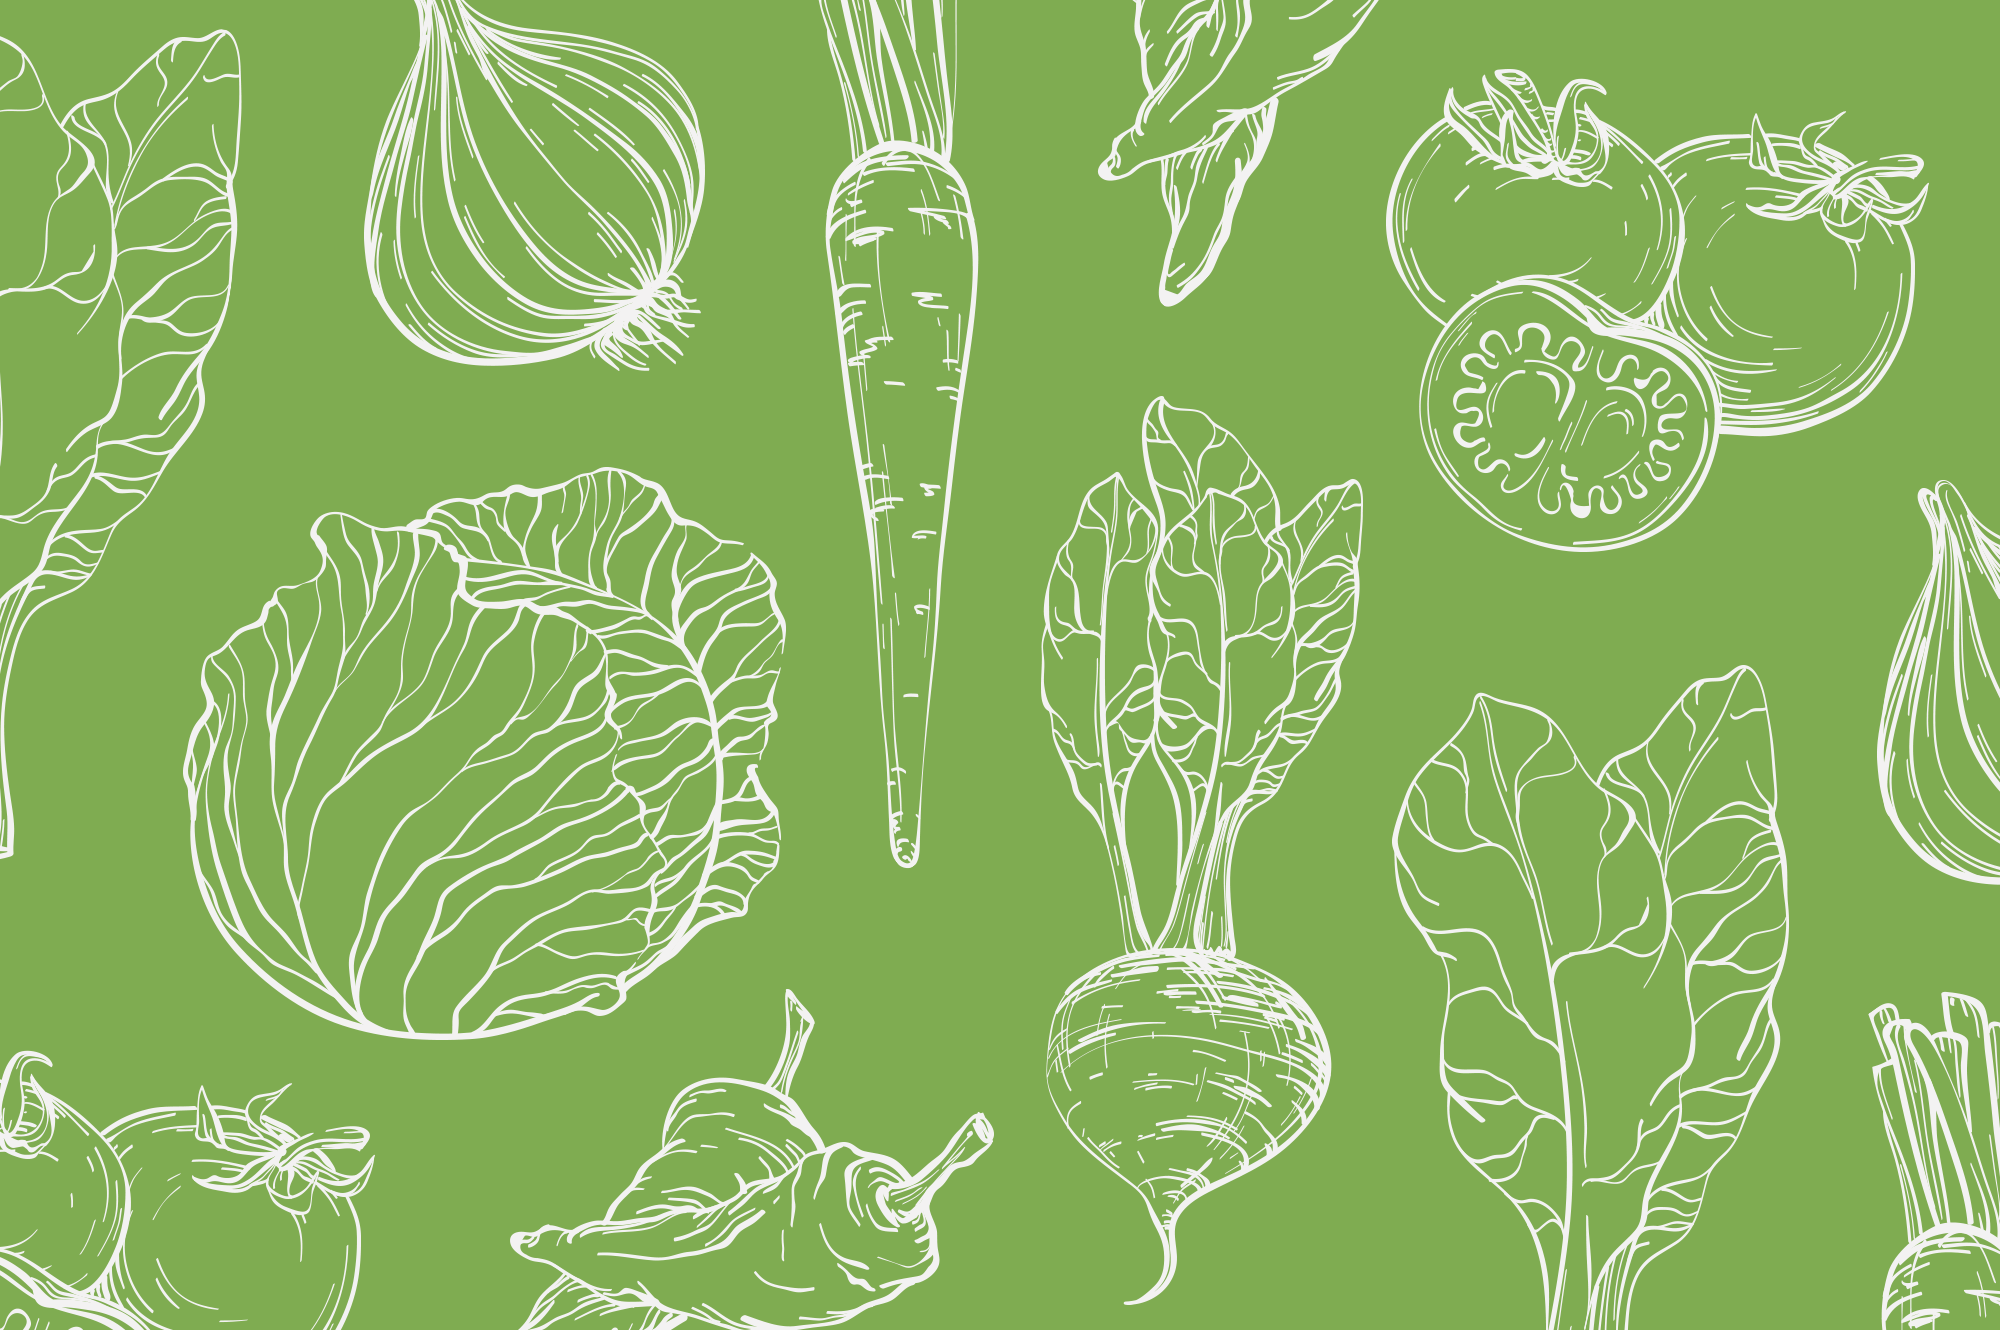 Image of: 10 Easiest Vegetables To Grow Easy To Grow Vegetables For Beginner Gardeners